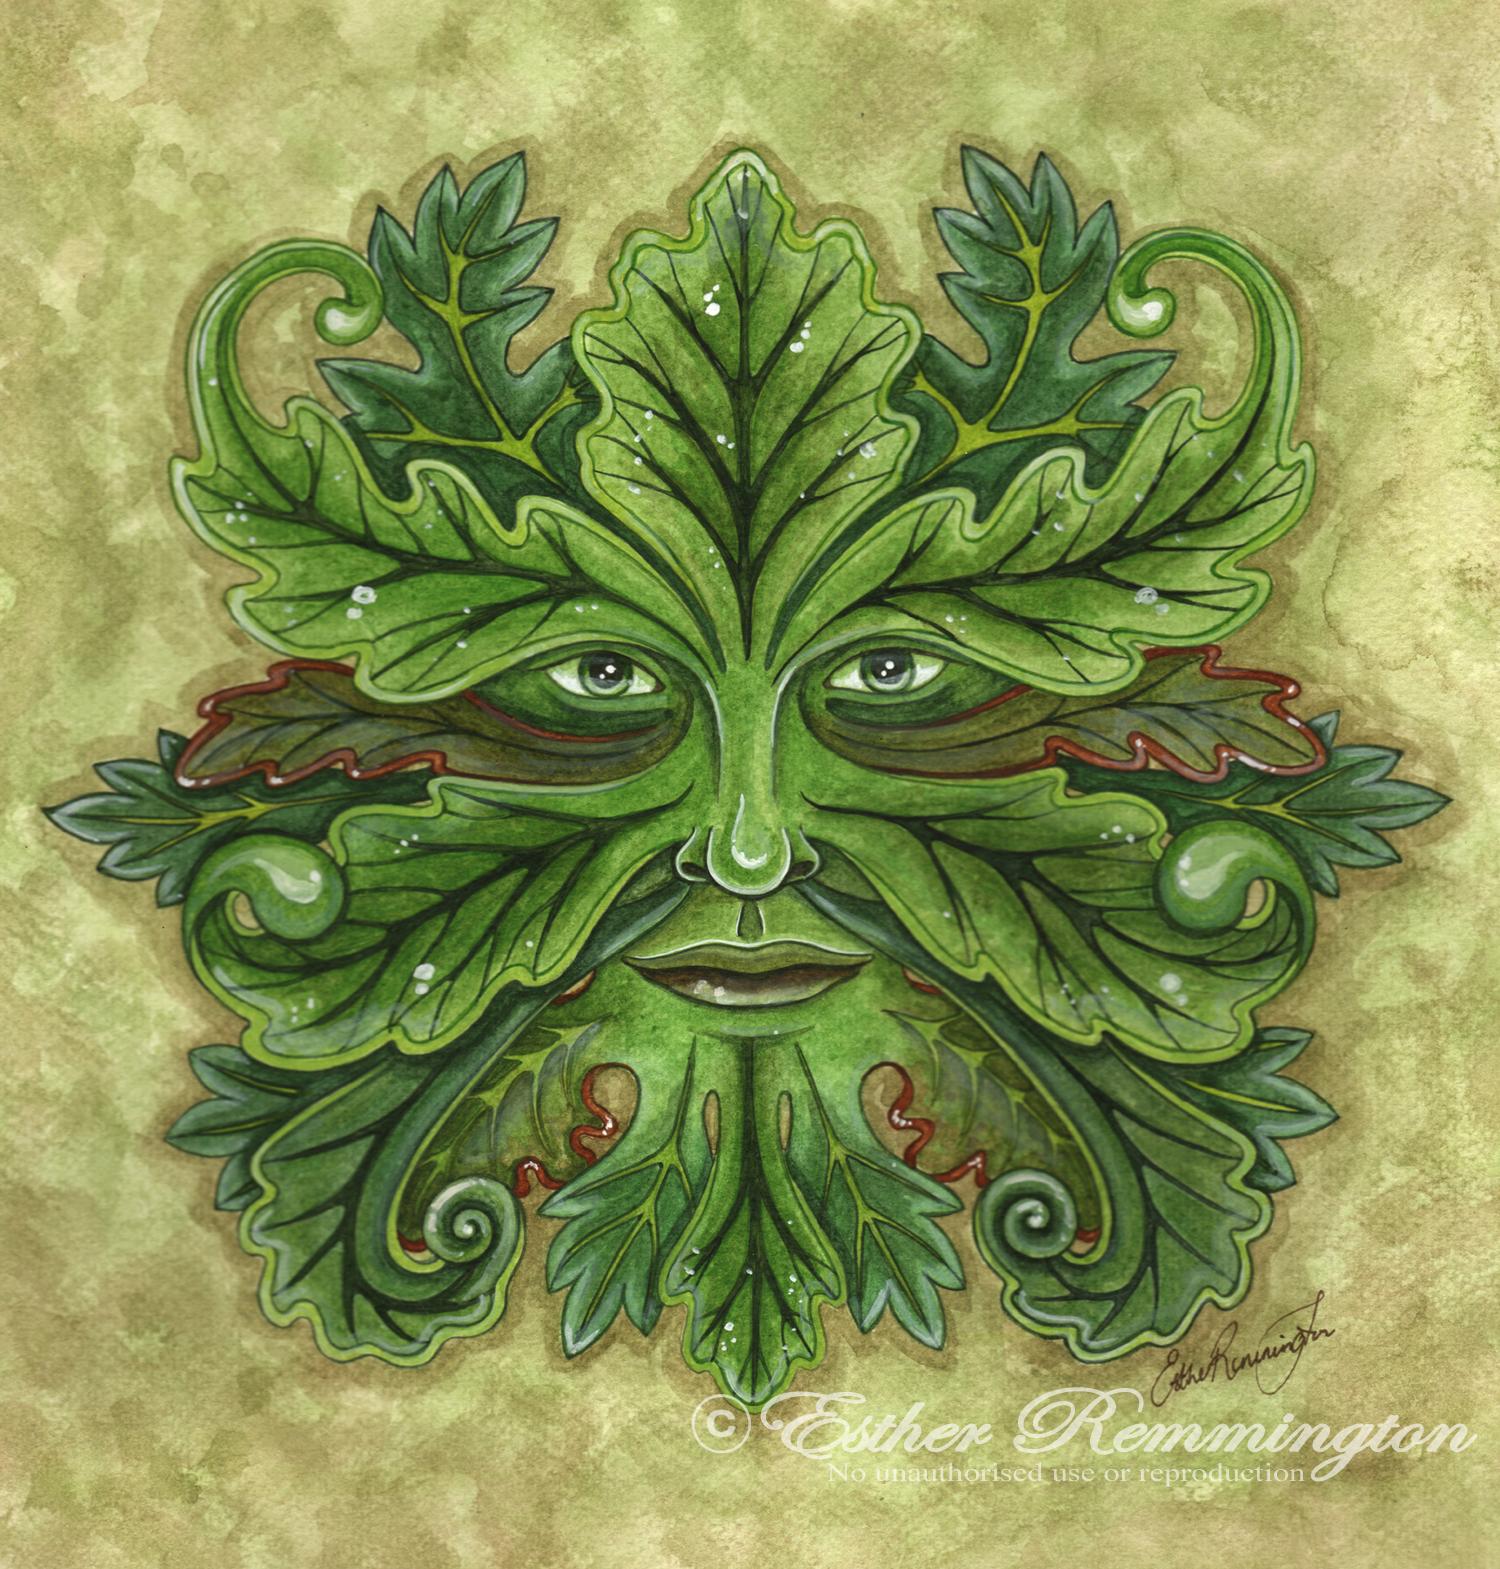 Green Man - 2012